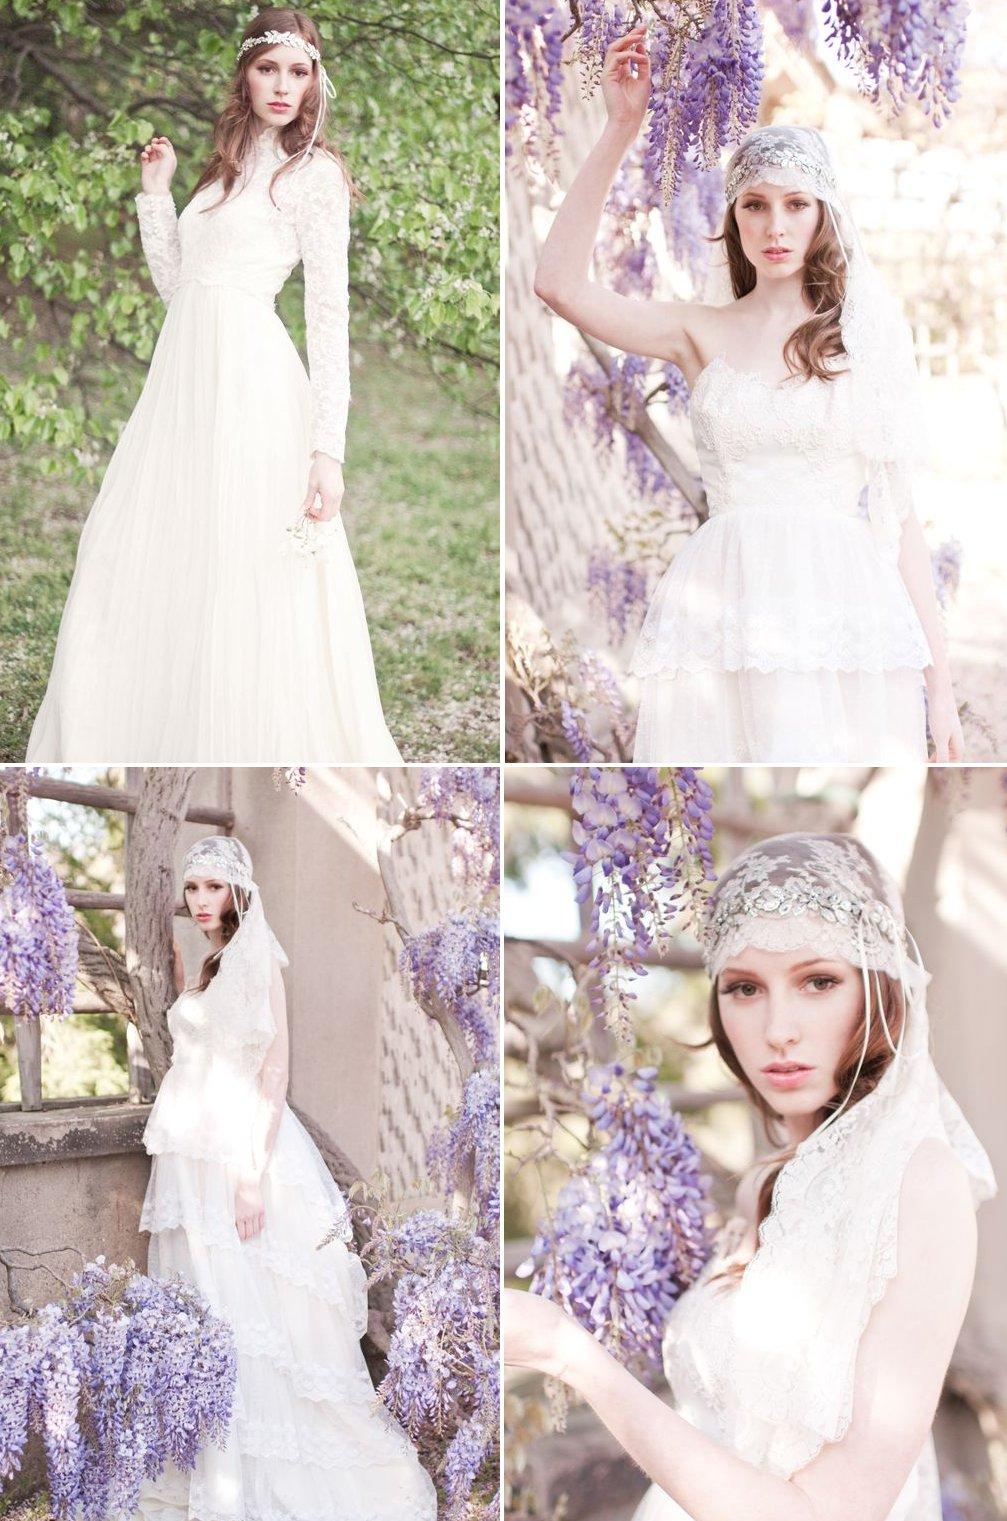 Romantic-wedding-accessories-bridal-veils-headpieces.full